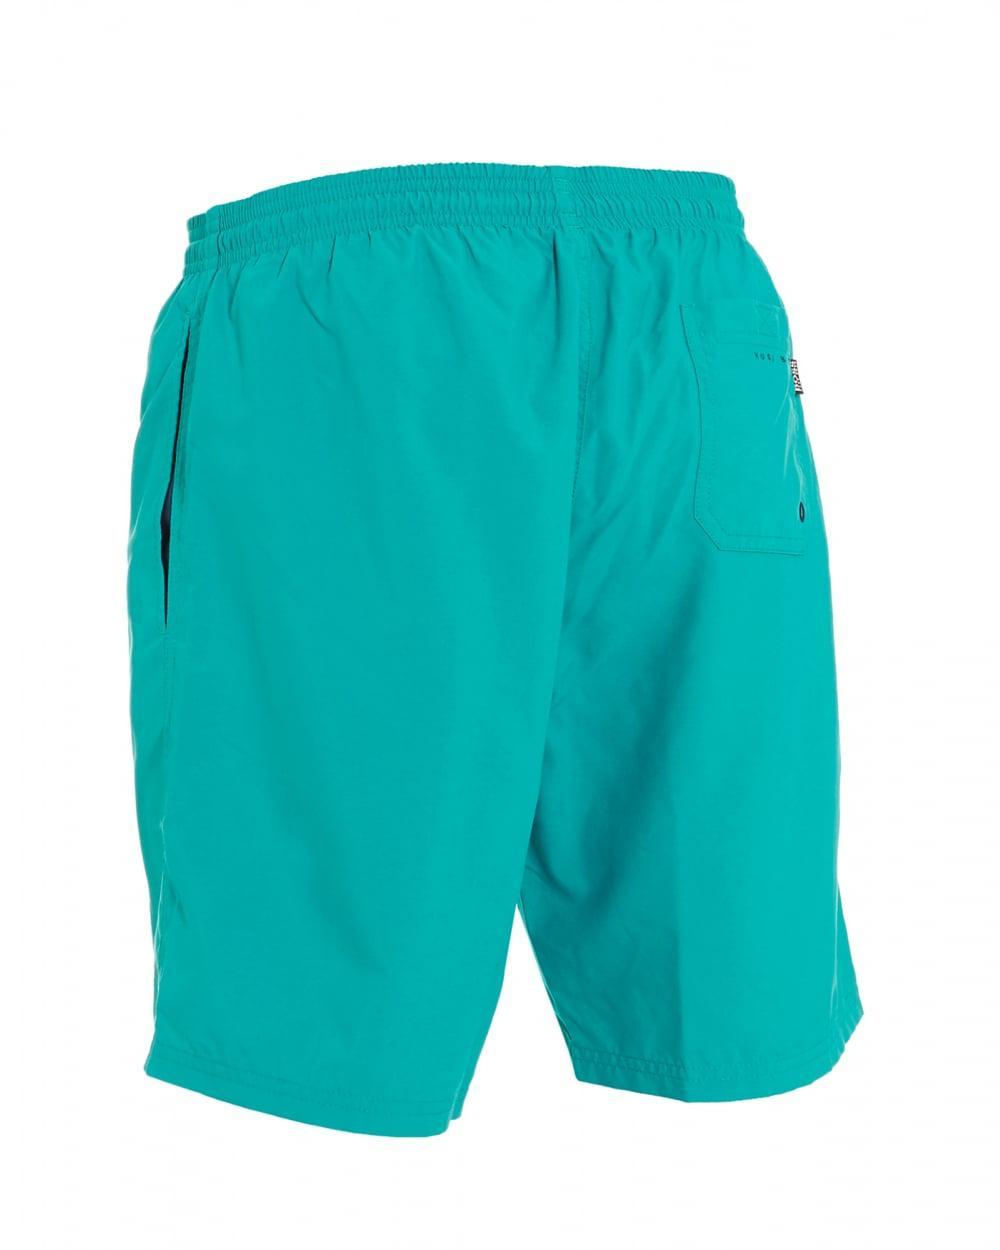 2bf04d46fb BOSS Orca Aqua Blue Mid Length Swim Shorts in Blue for Men - Lyst